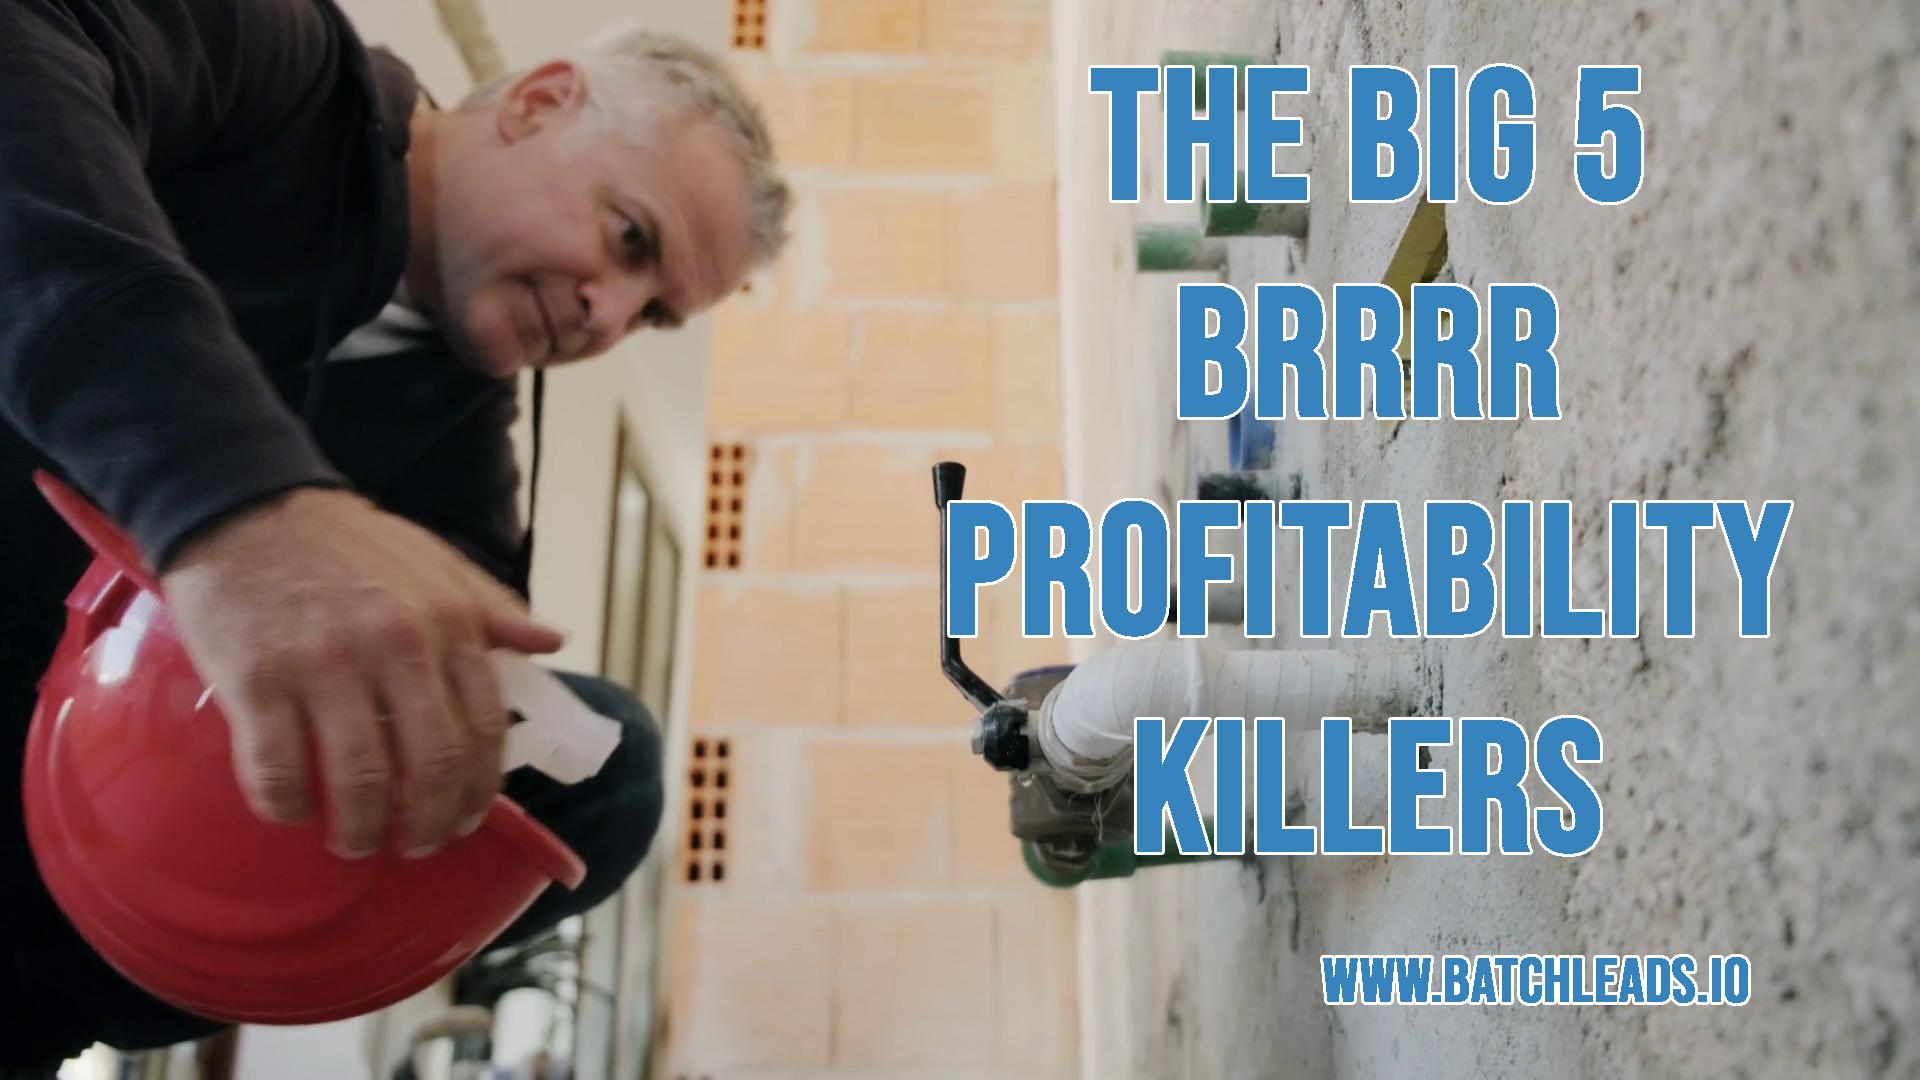 The Big 5 BRRRR Profitability Killers